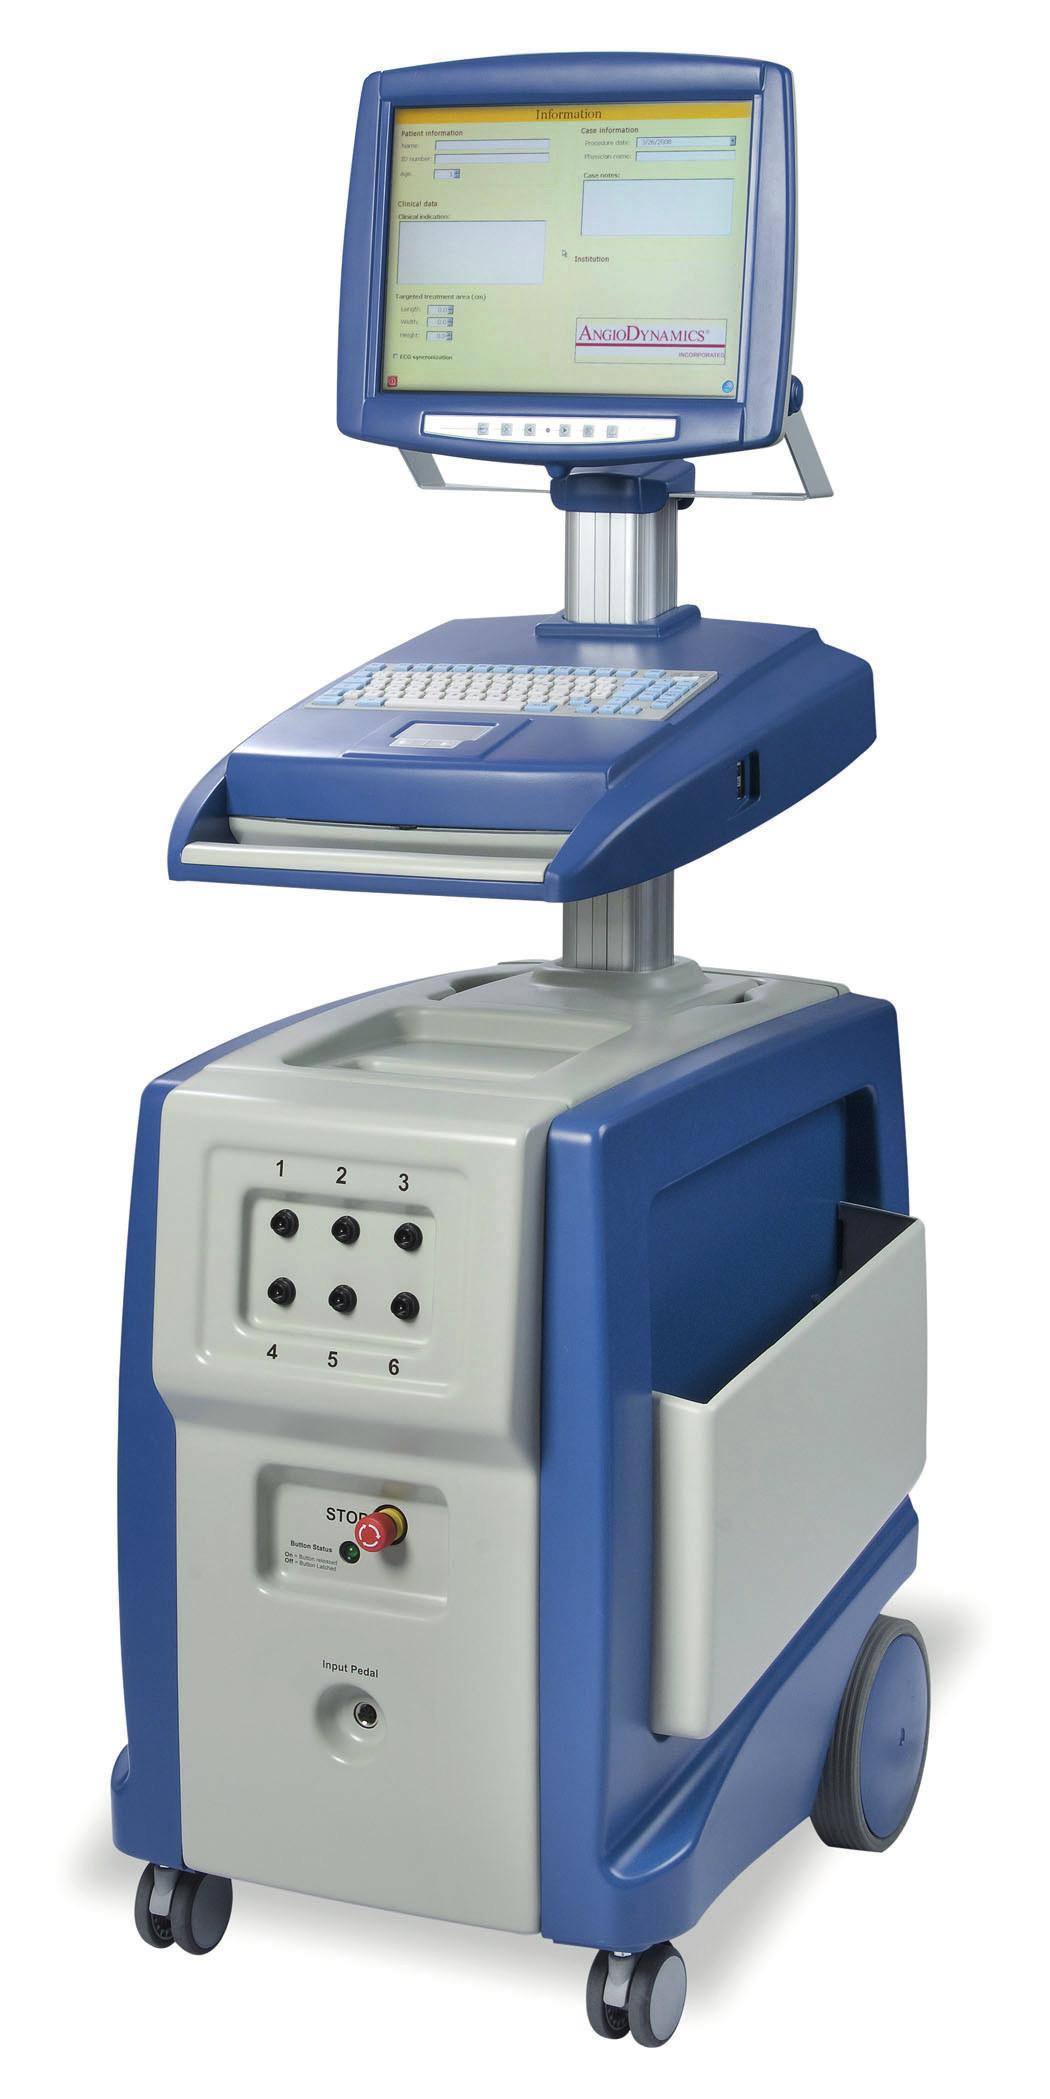 Generátor elektrických pulzů IRE (Angiodynamics, USA) Fig. 1. Electrical pulses generator of IRE (Angiodynamics, USA)